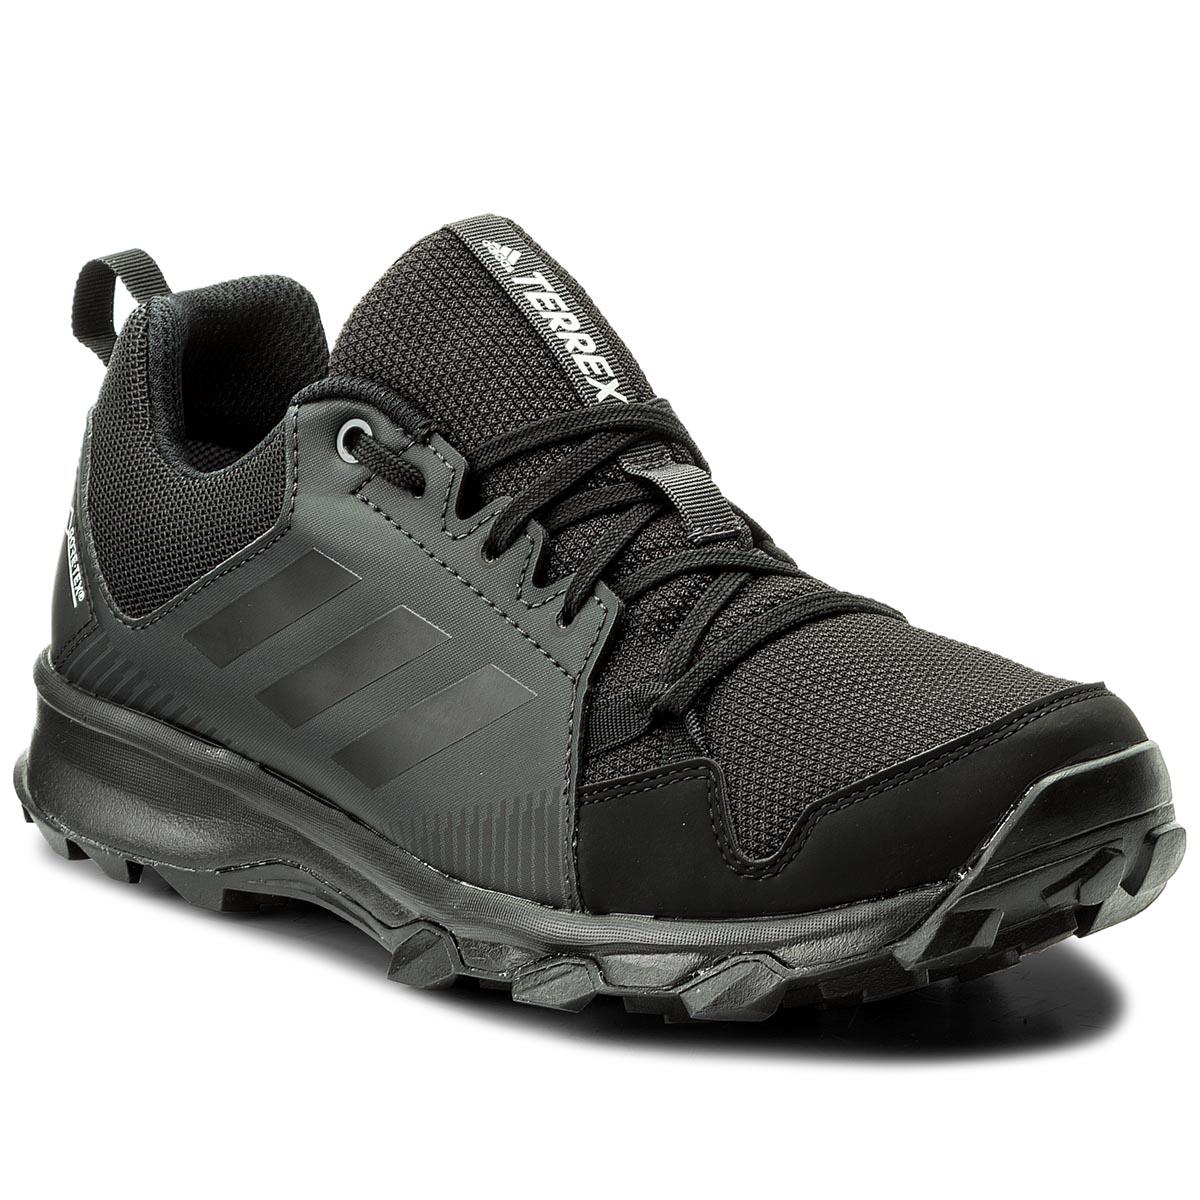 83fae76a410c6 Shoes adidas - Terrex Ax2r W AC8070 Cblack Cblack Ashgrn - Trekker ...